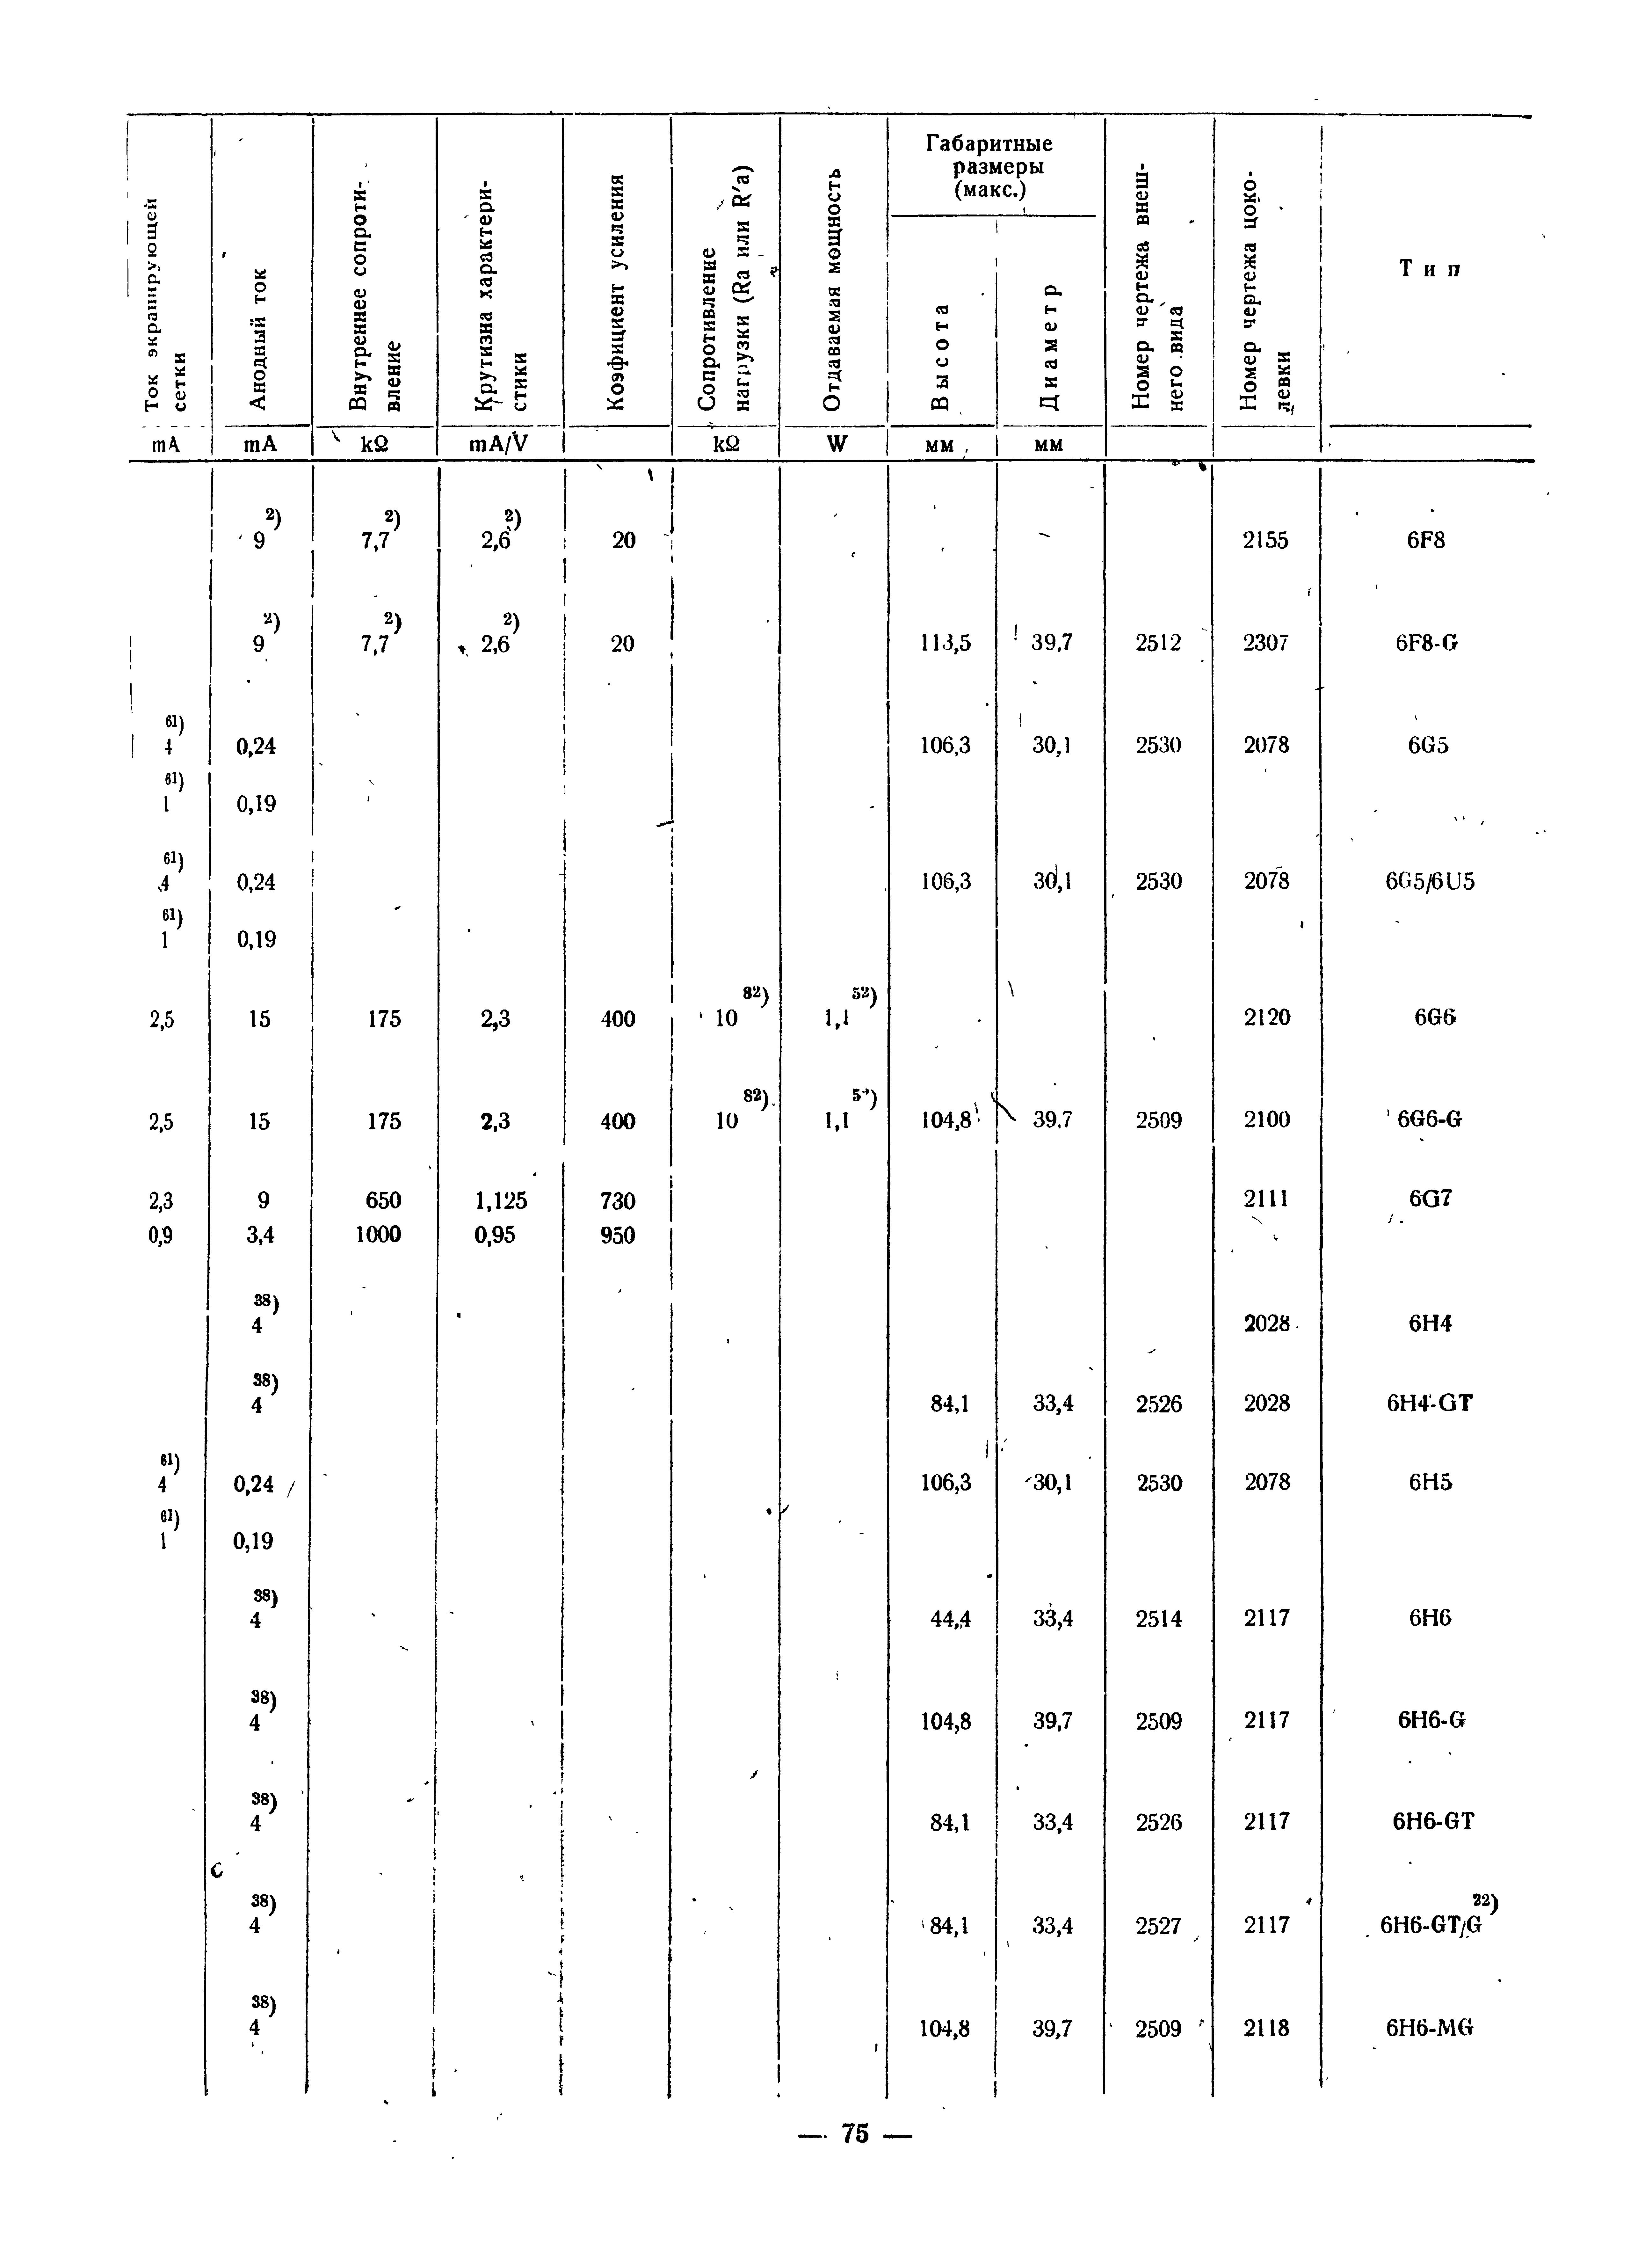 Нажмите на изображение для увеличения.  Название:abc1.png Просмотров:18 Размер:168.7 Кб ID:200450